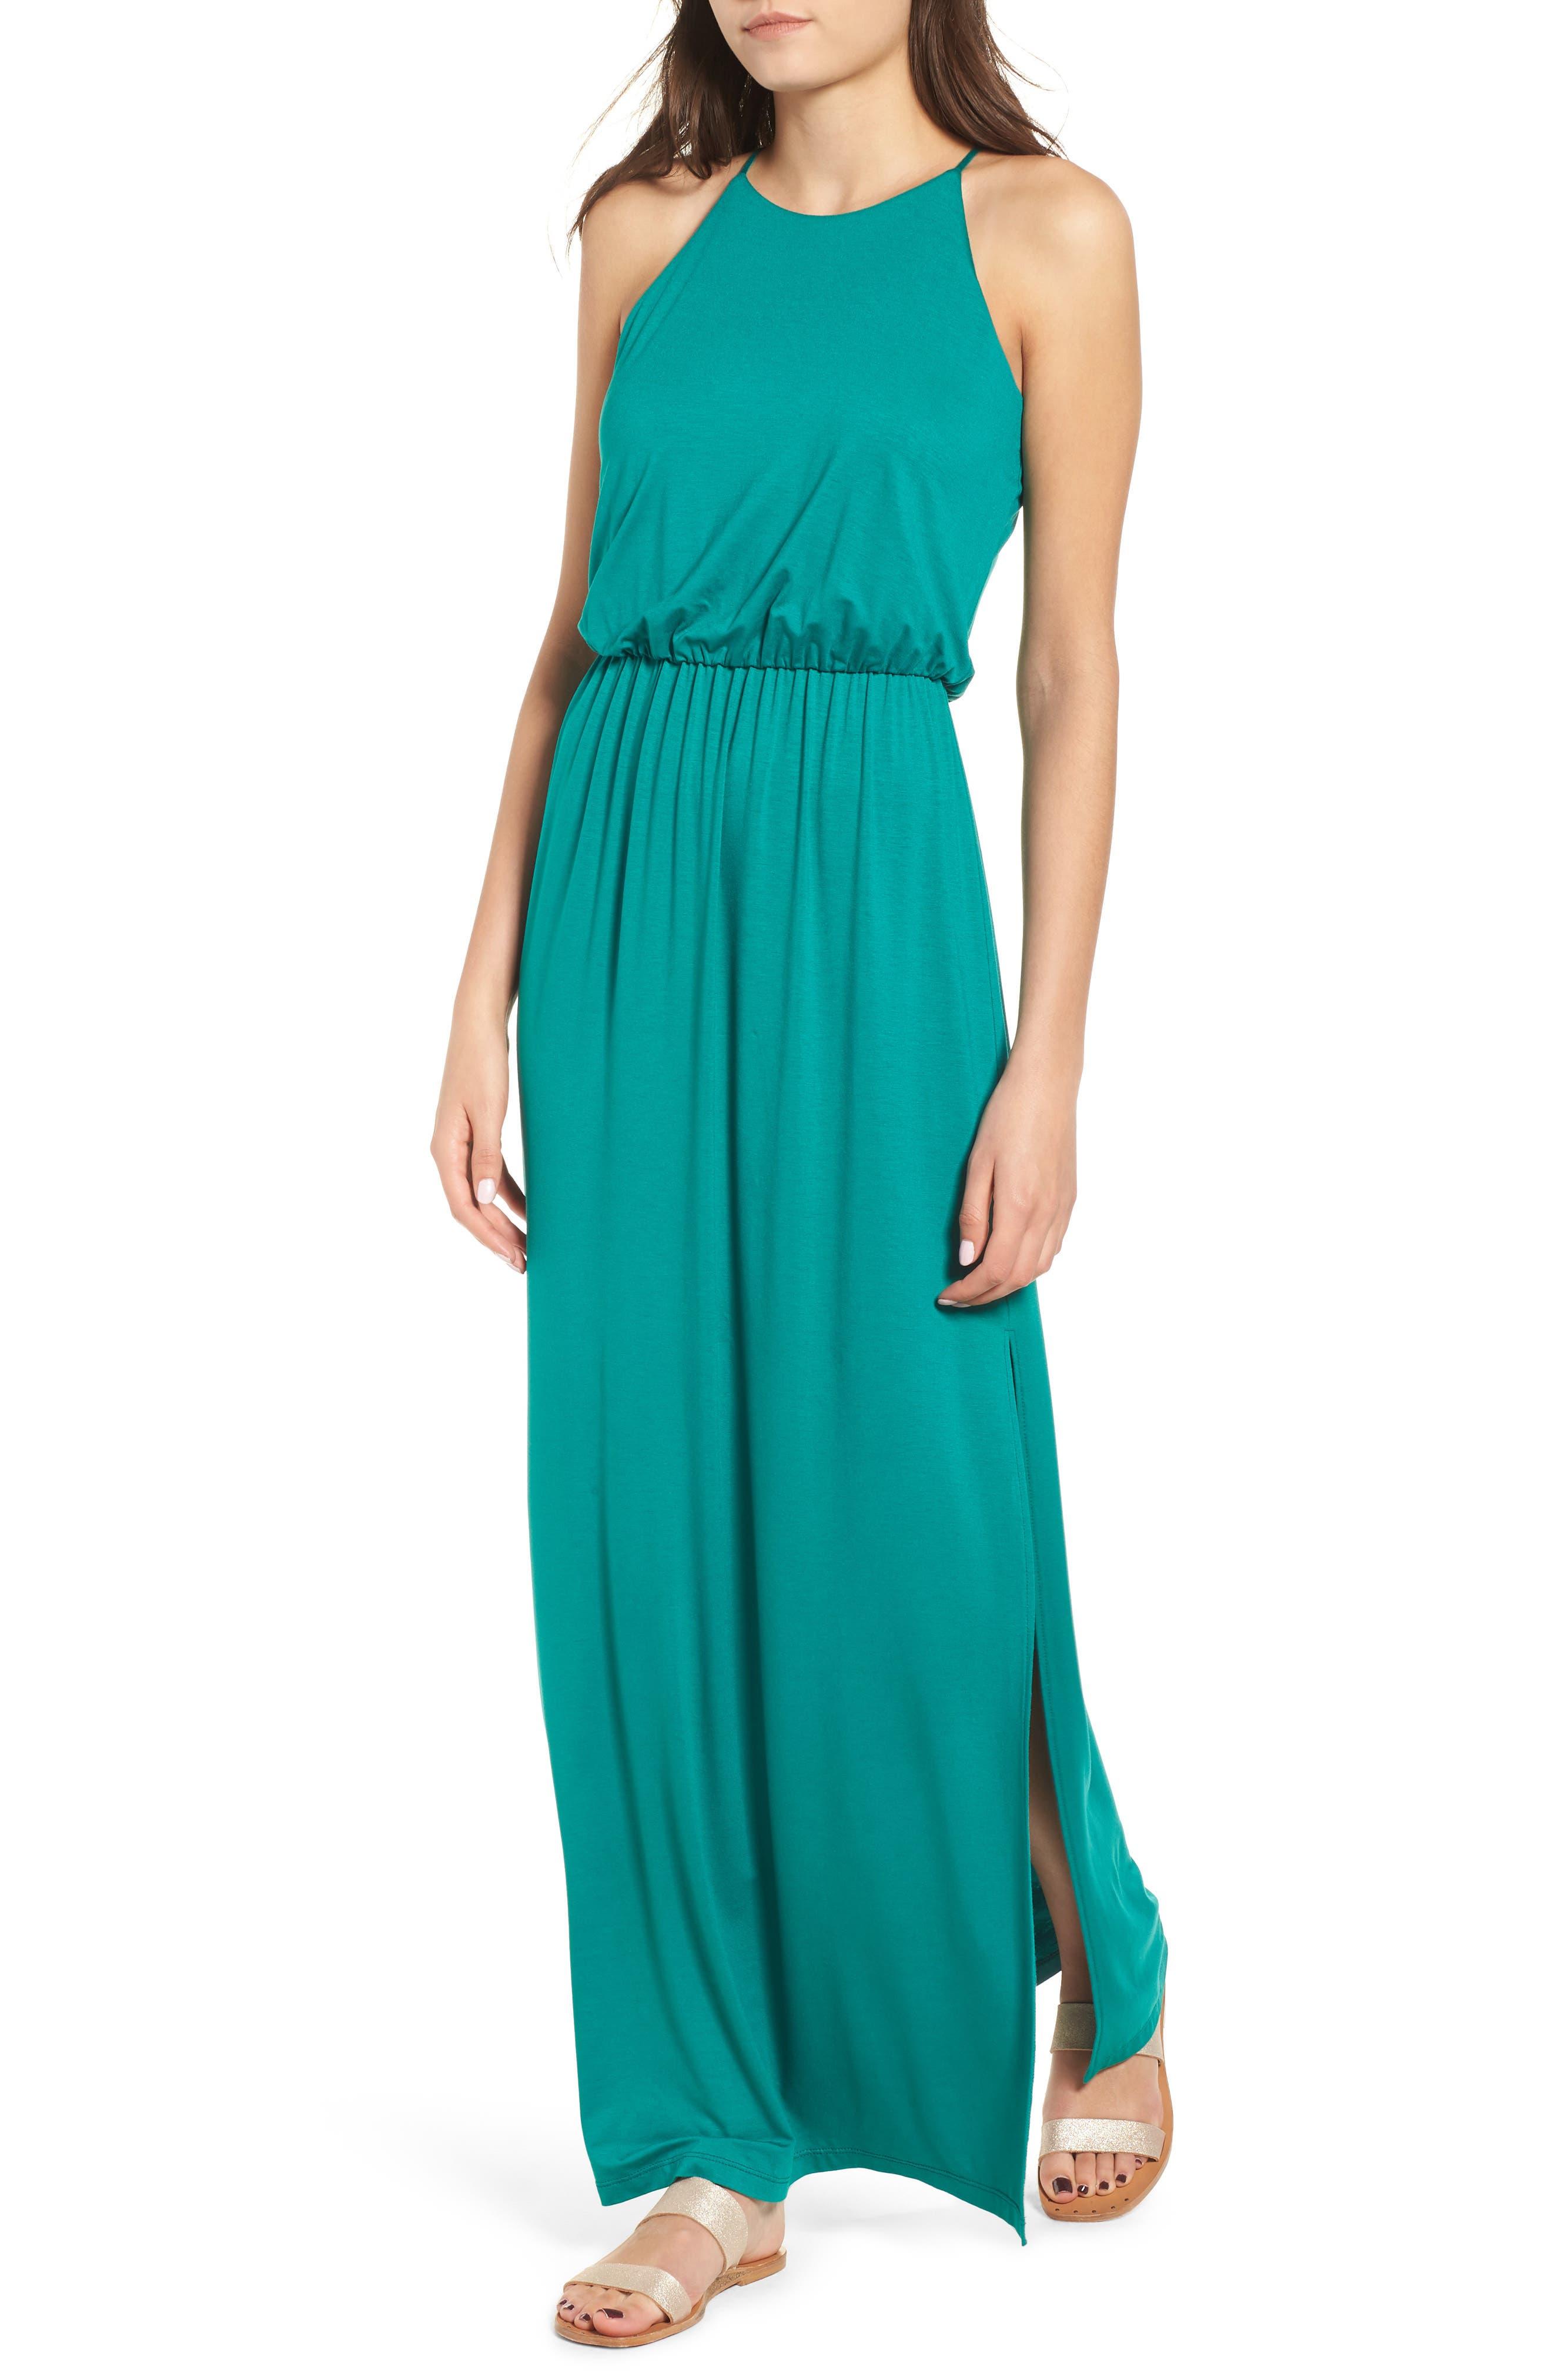 Dresses Clothes for Juniors | Nordstrom